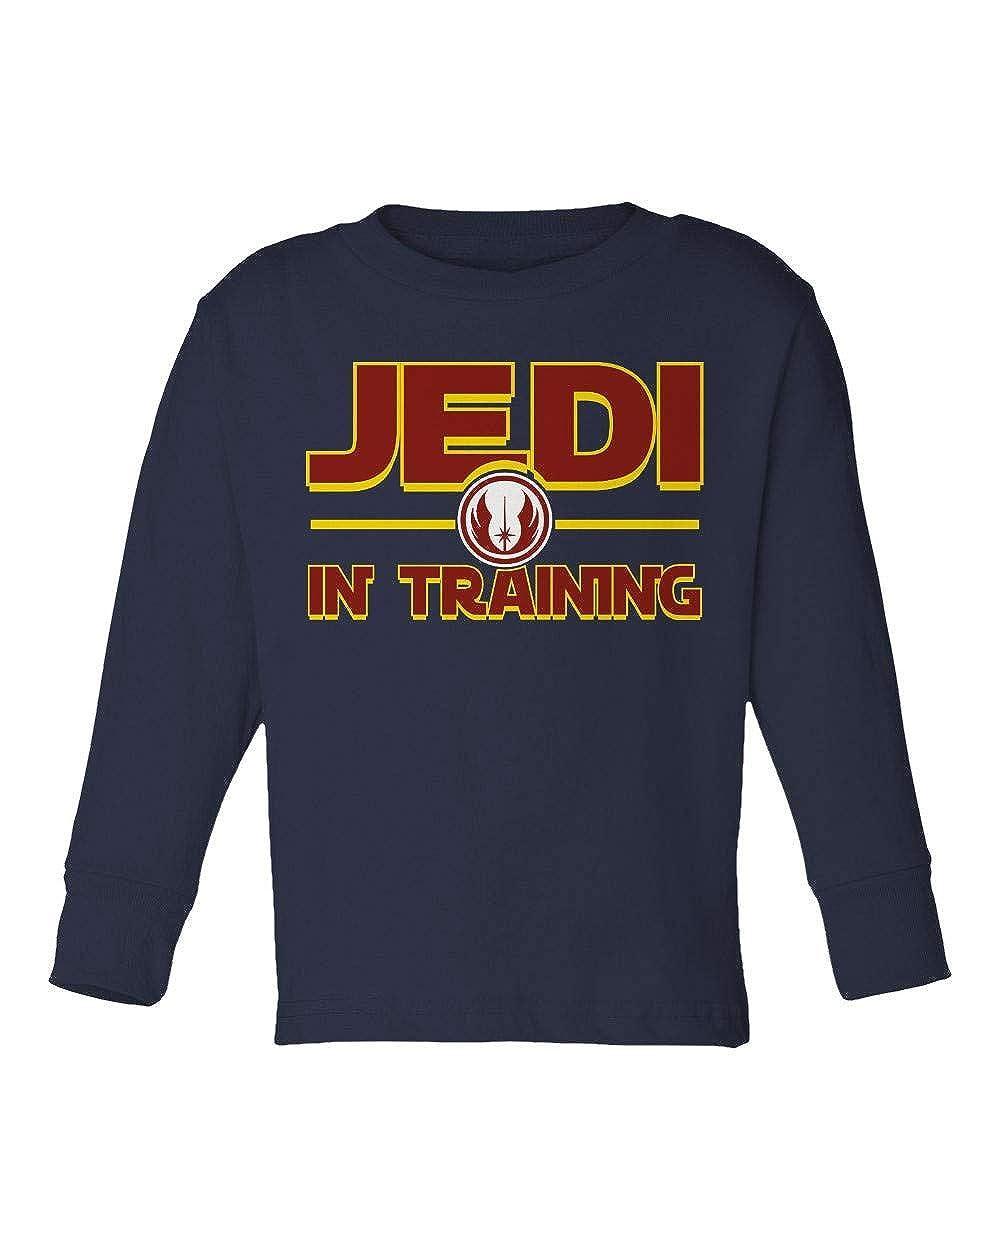 Societee Jedi in Training Star Force Cool Retro Girls Boys Toddler Long Sleeve T-Shirt